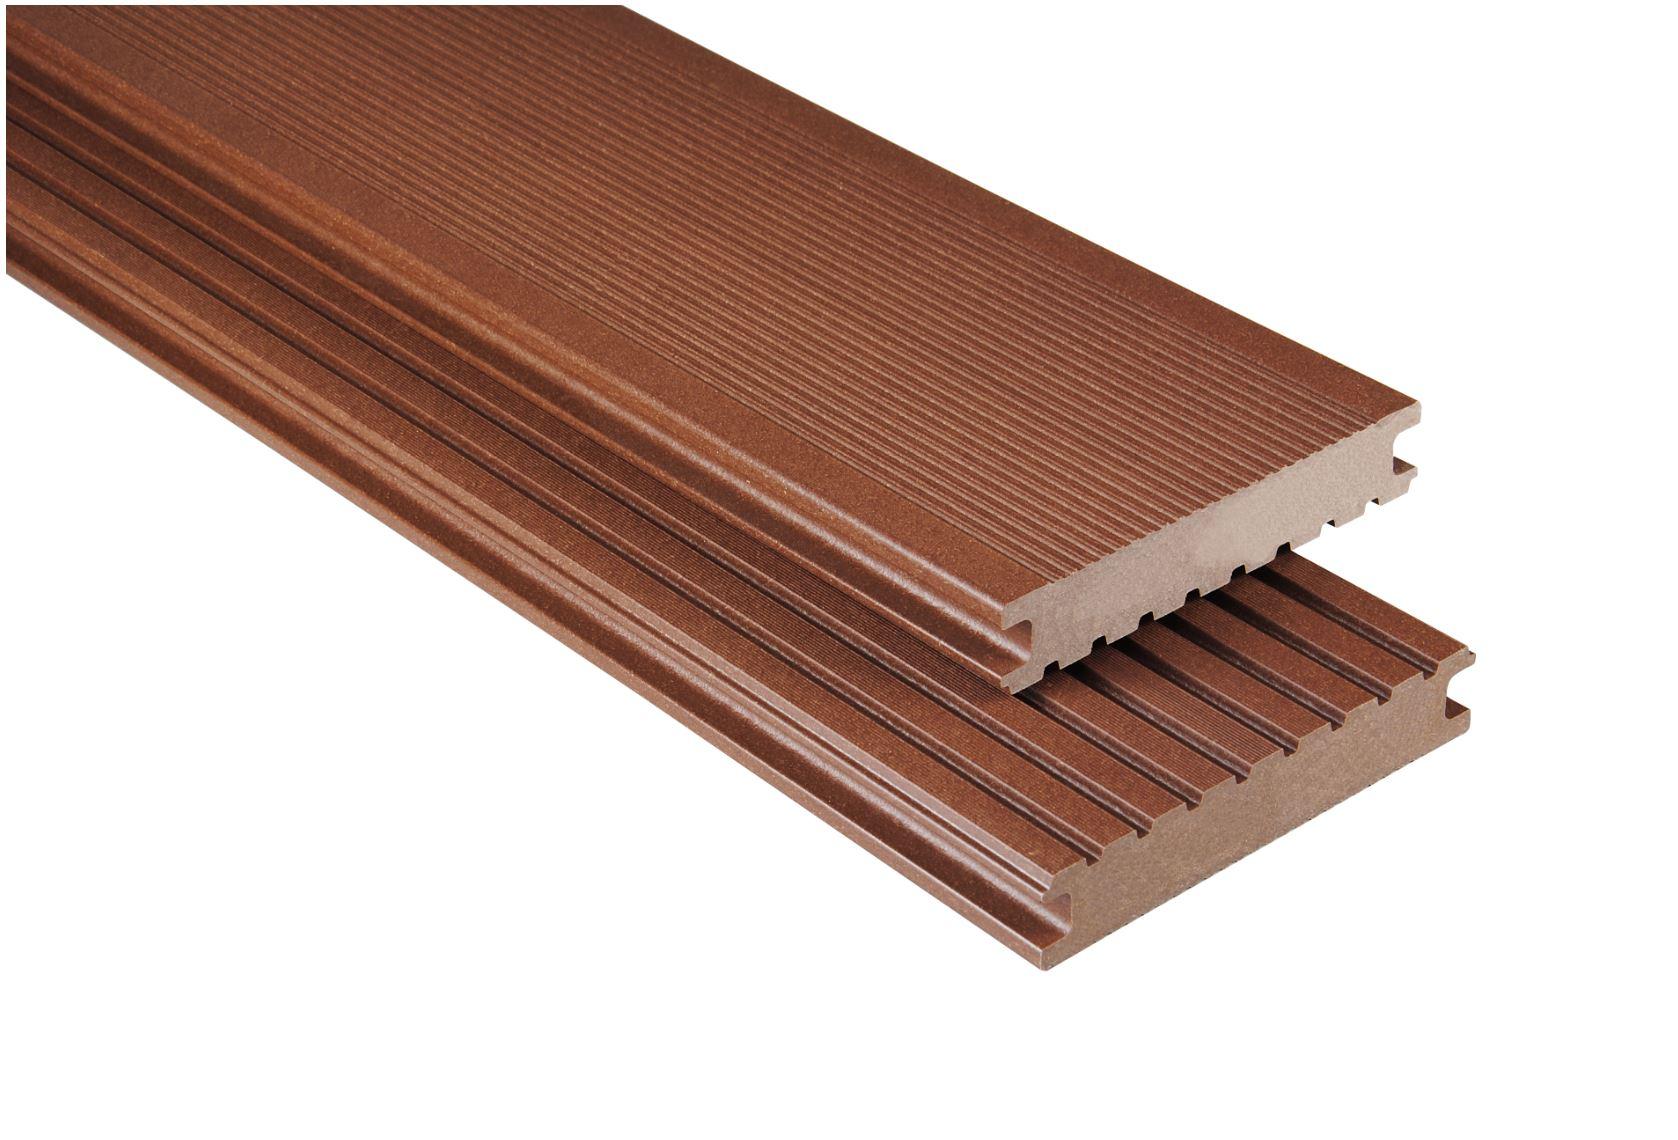 Standard Vollprofil Braun mattiert, 26x145 mm